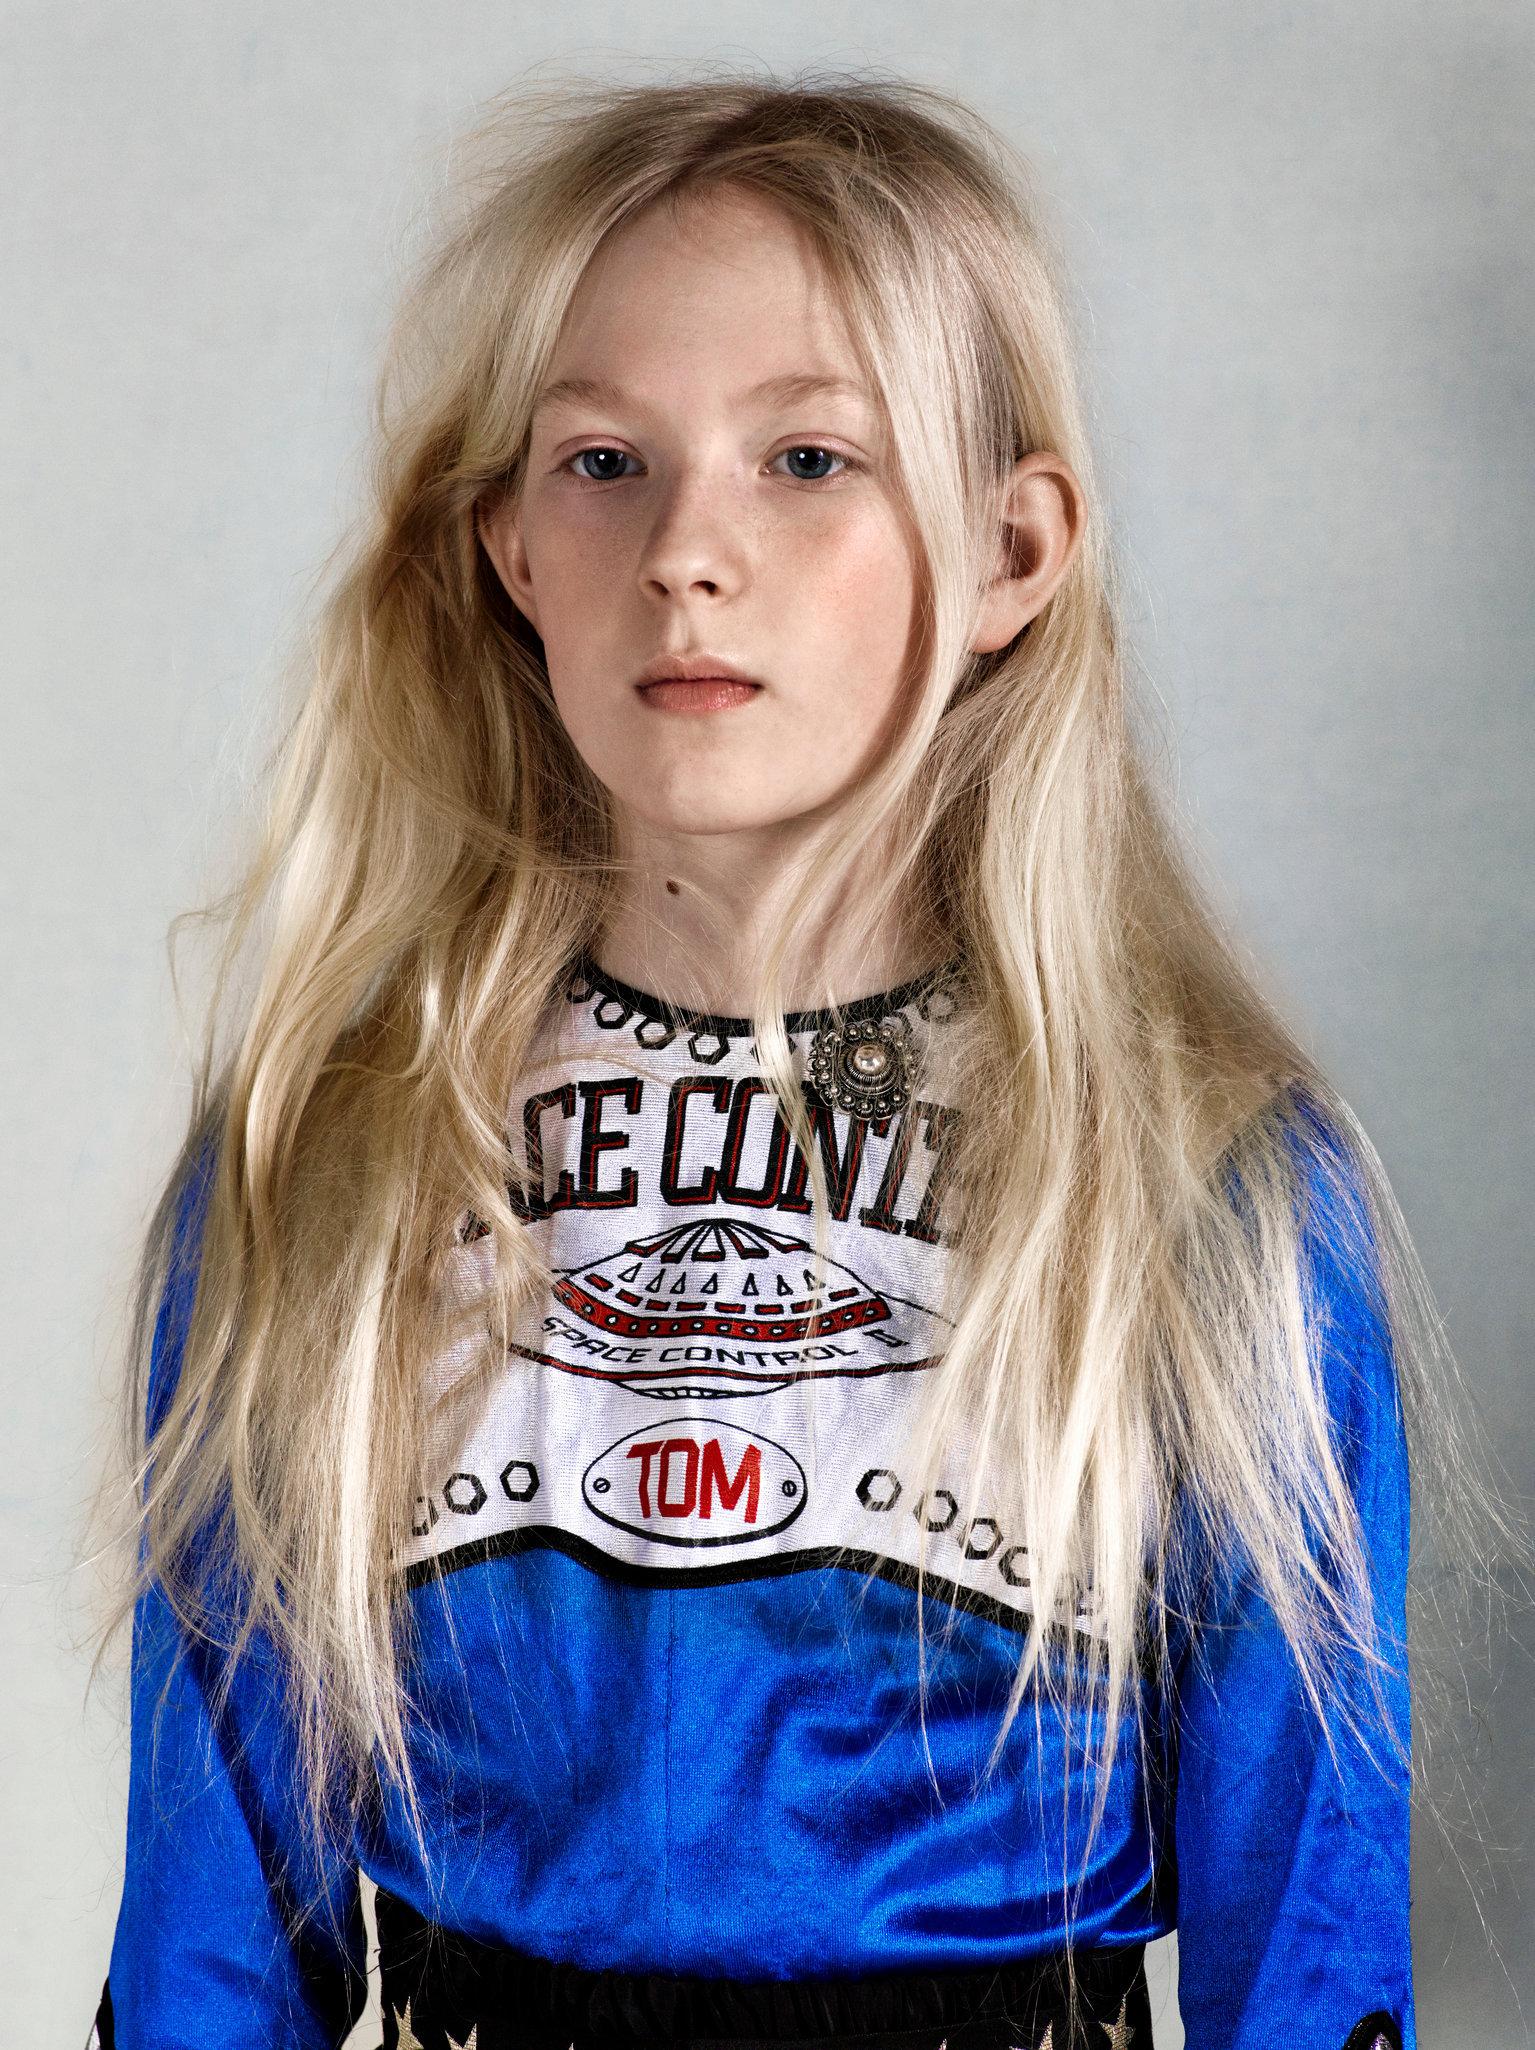 Marijke-de-Gruyter-Jet-Vervest-Something Old-03_RGB.jpg